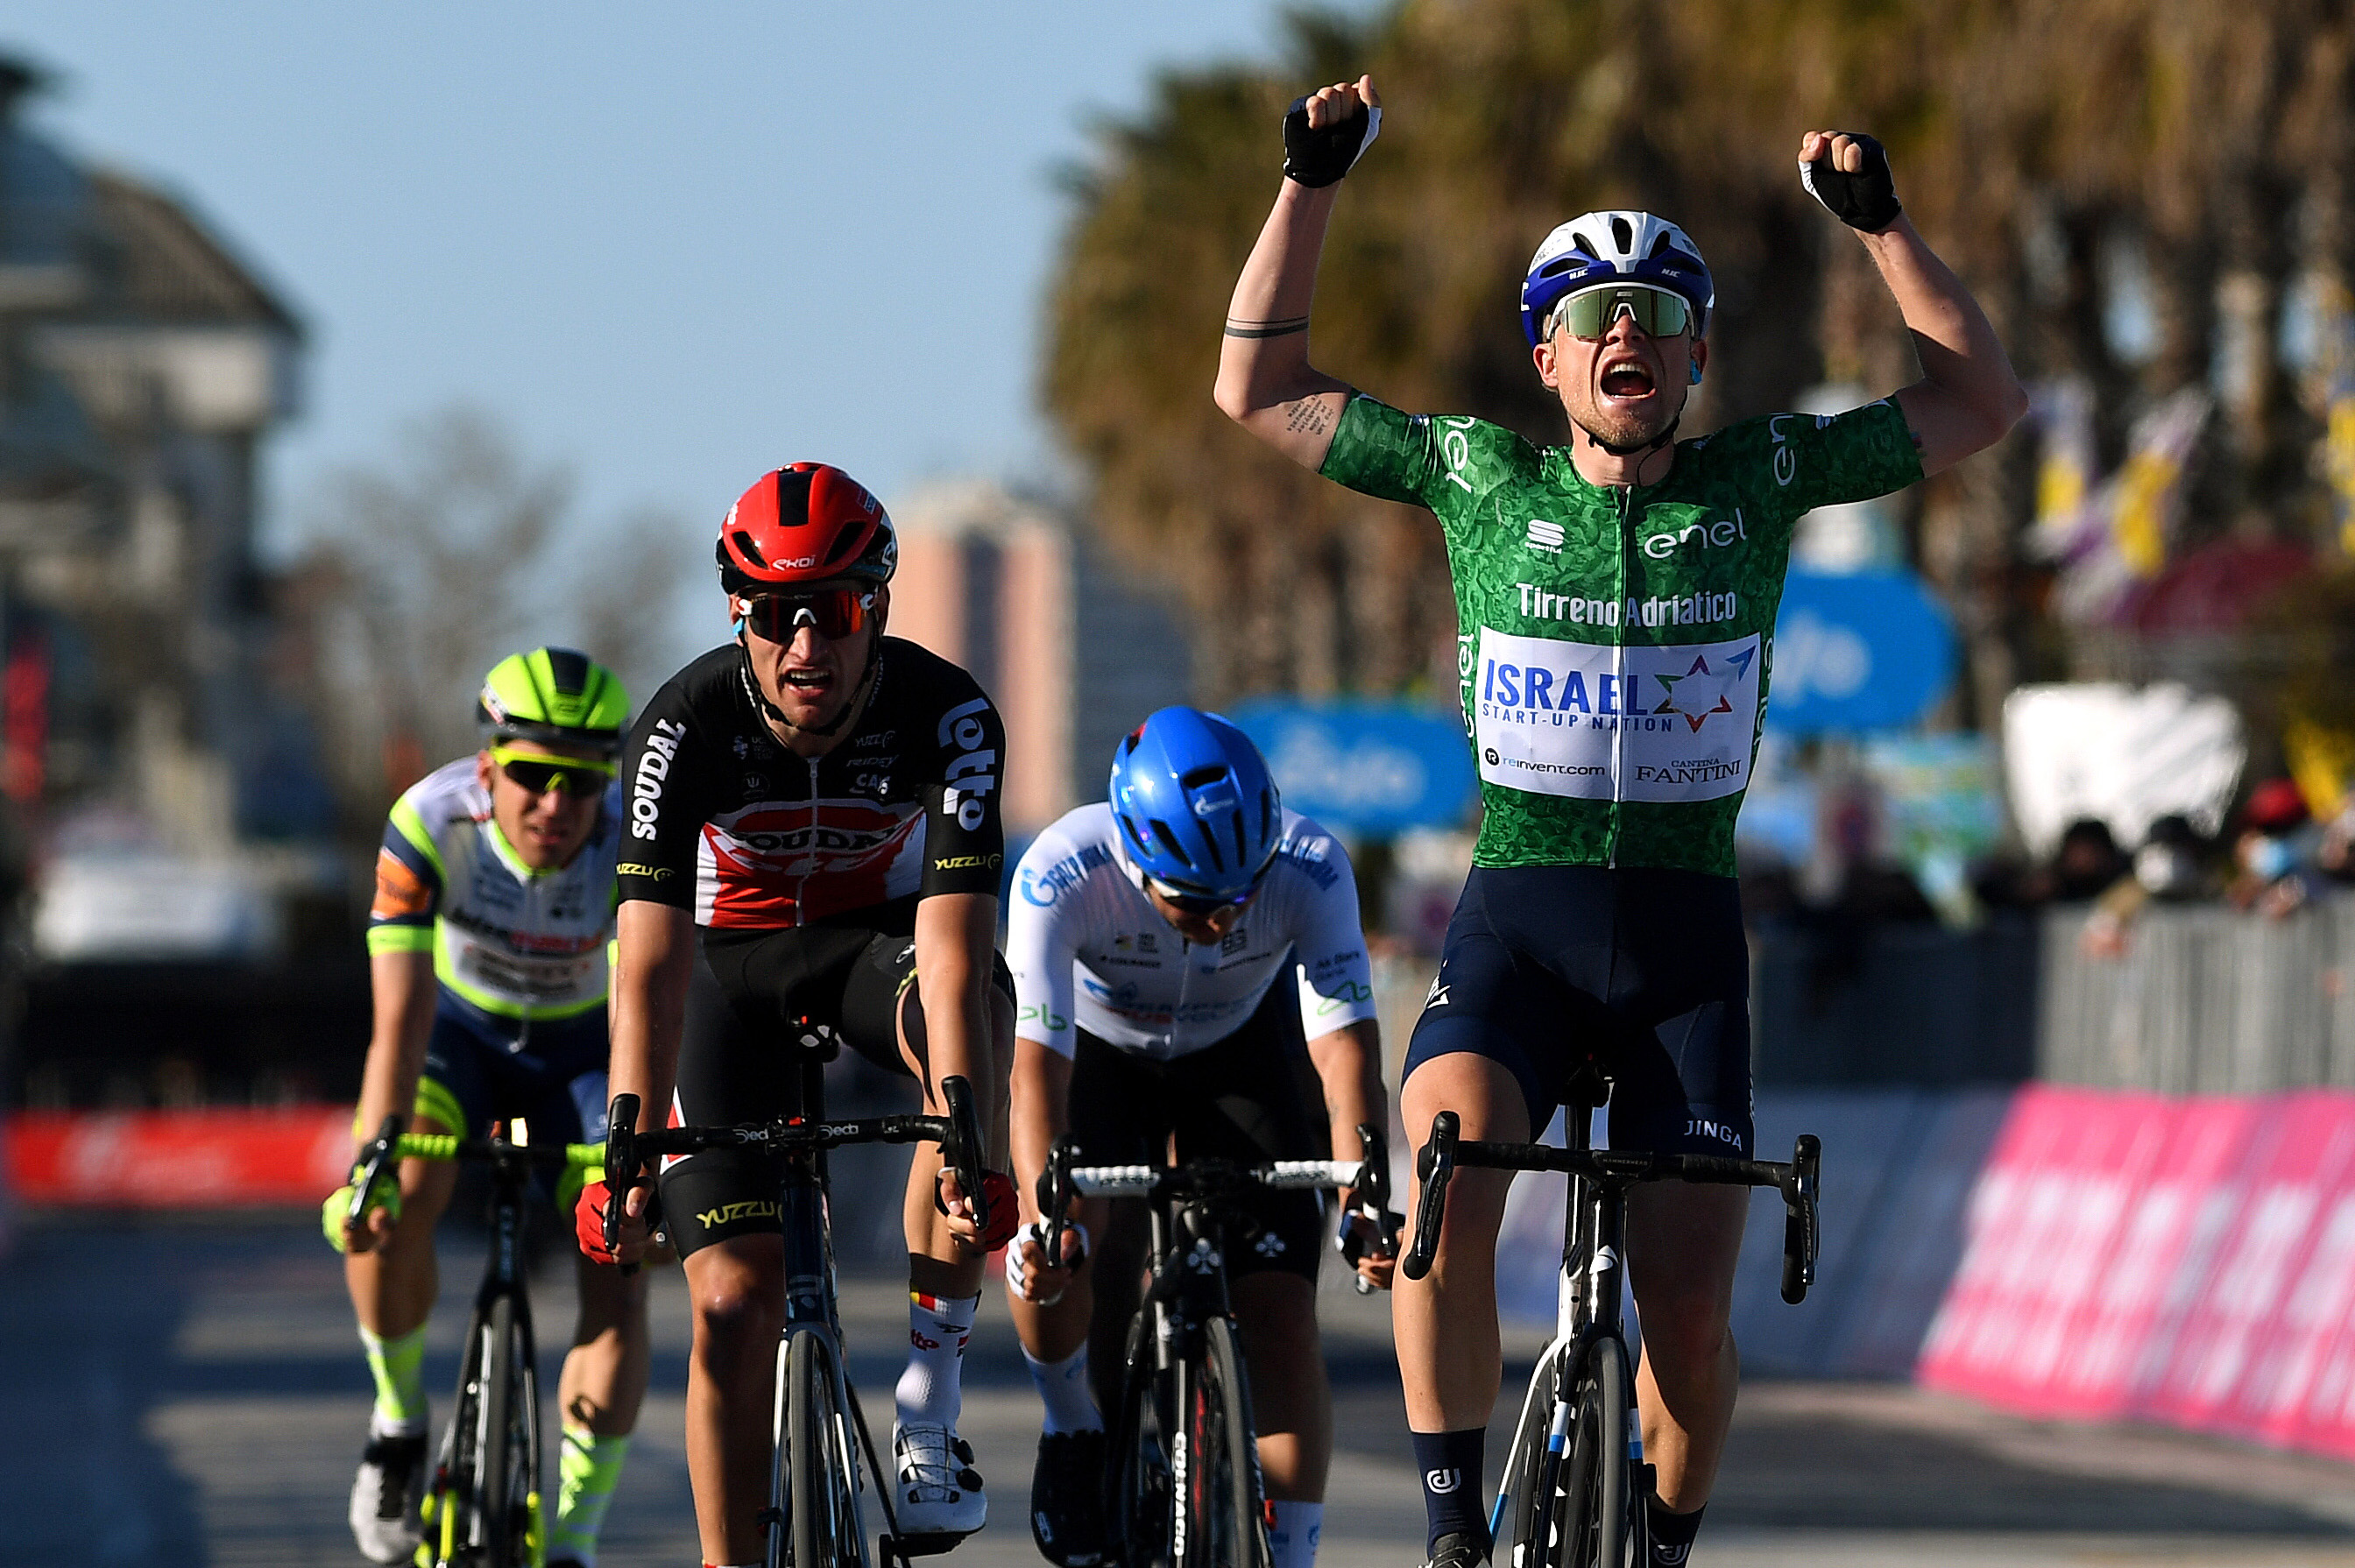 Mads Wurtz Schmidt wins stage 6 of the 2021 Tirreno-Adriatico.